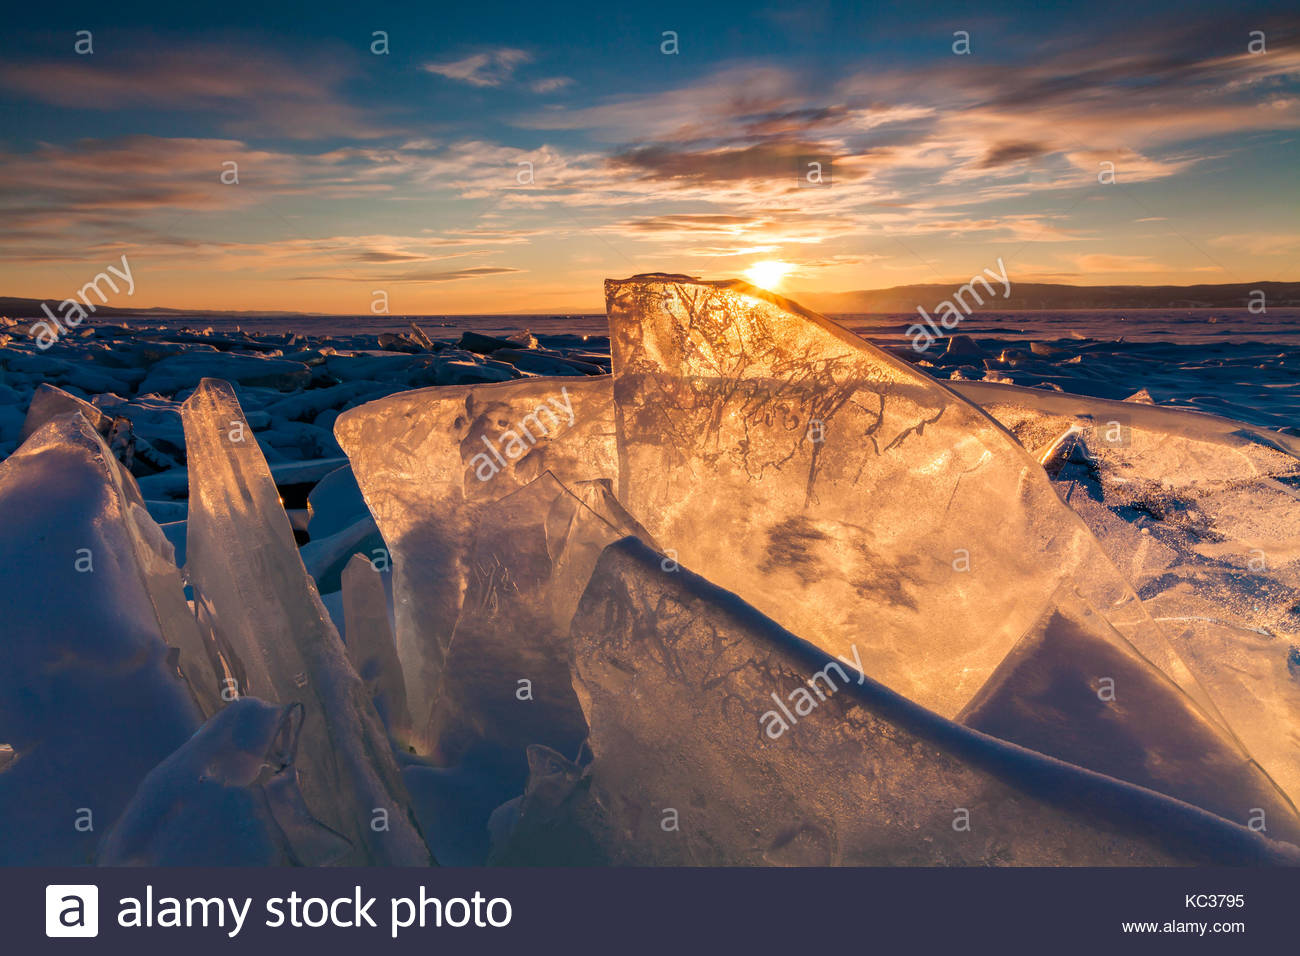 Colorful sunset over the crystal ice of Baikal lake - Stock Image